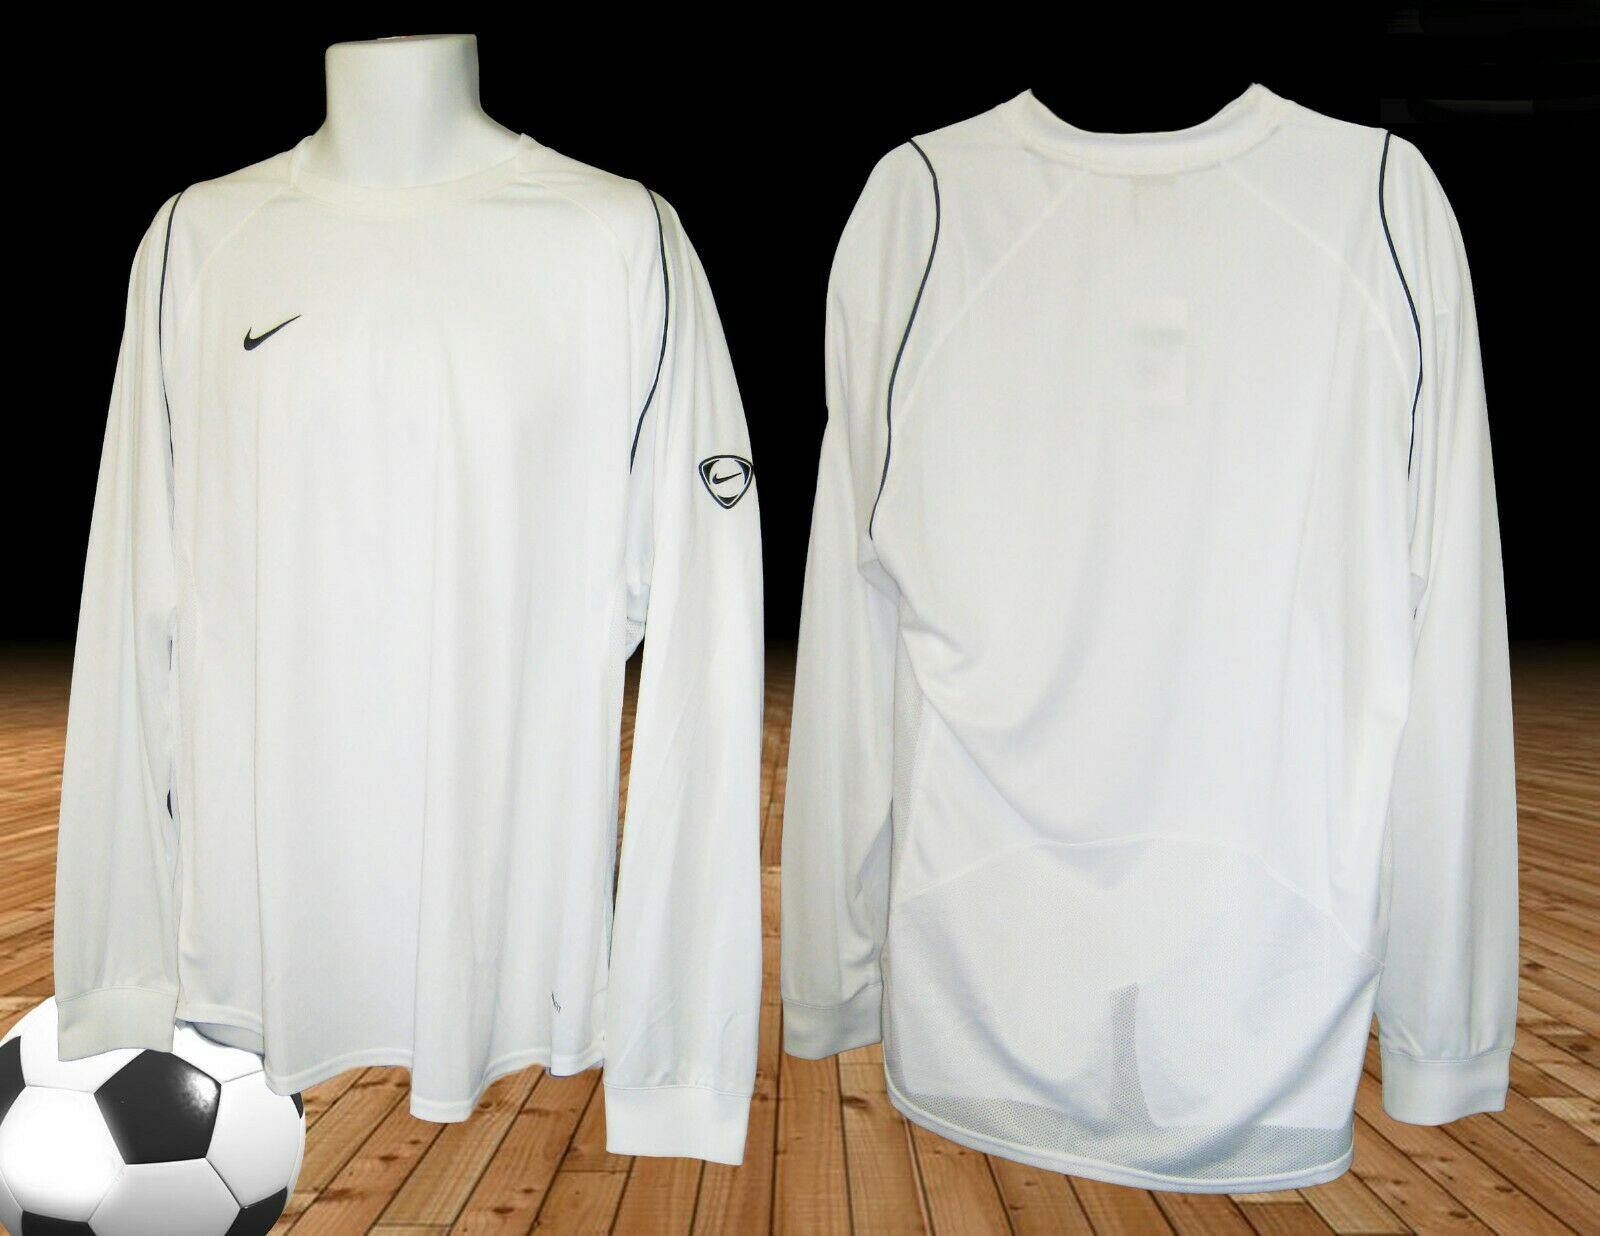 New NIKE TIEMPO Football Training Sweatshirt L